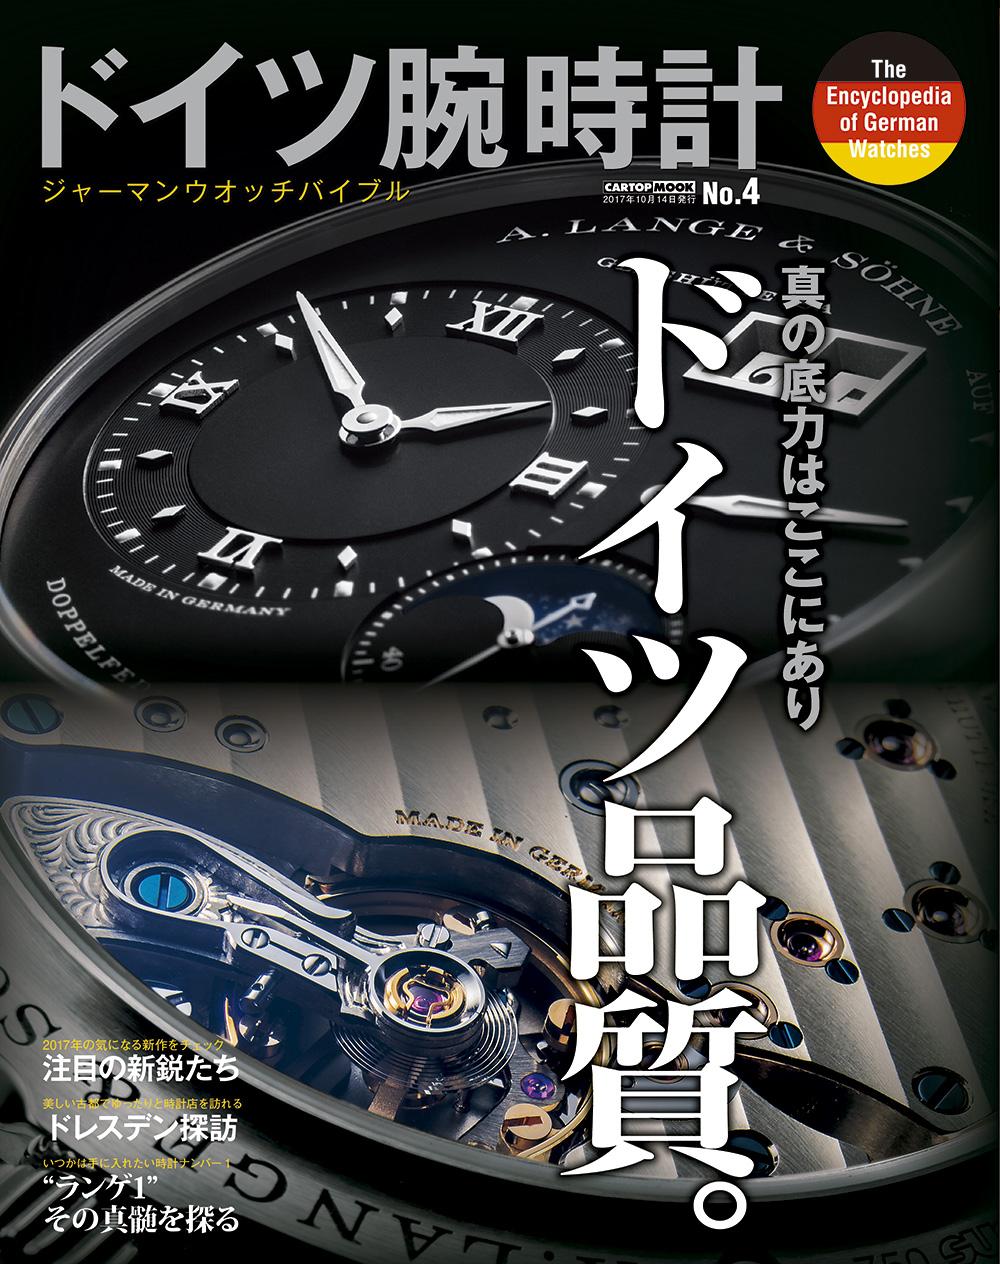 C's-Factory|電子書籍|ドイツ腕時計 No.4